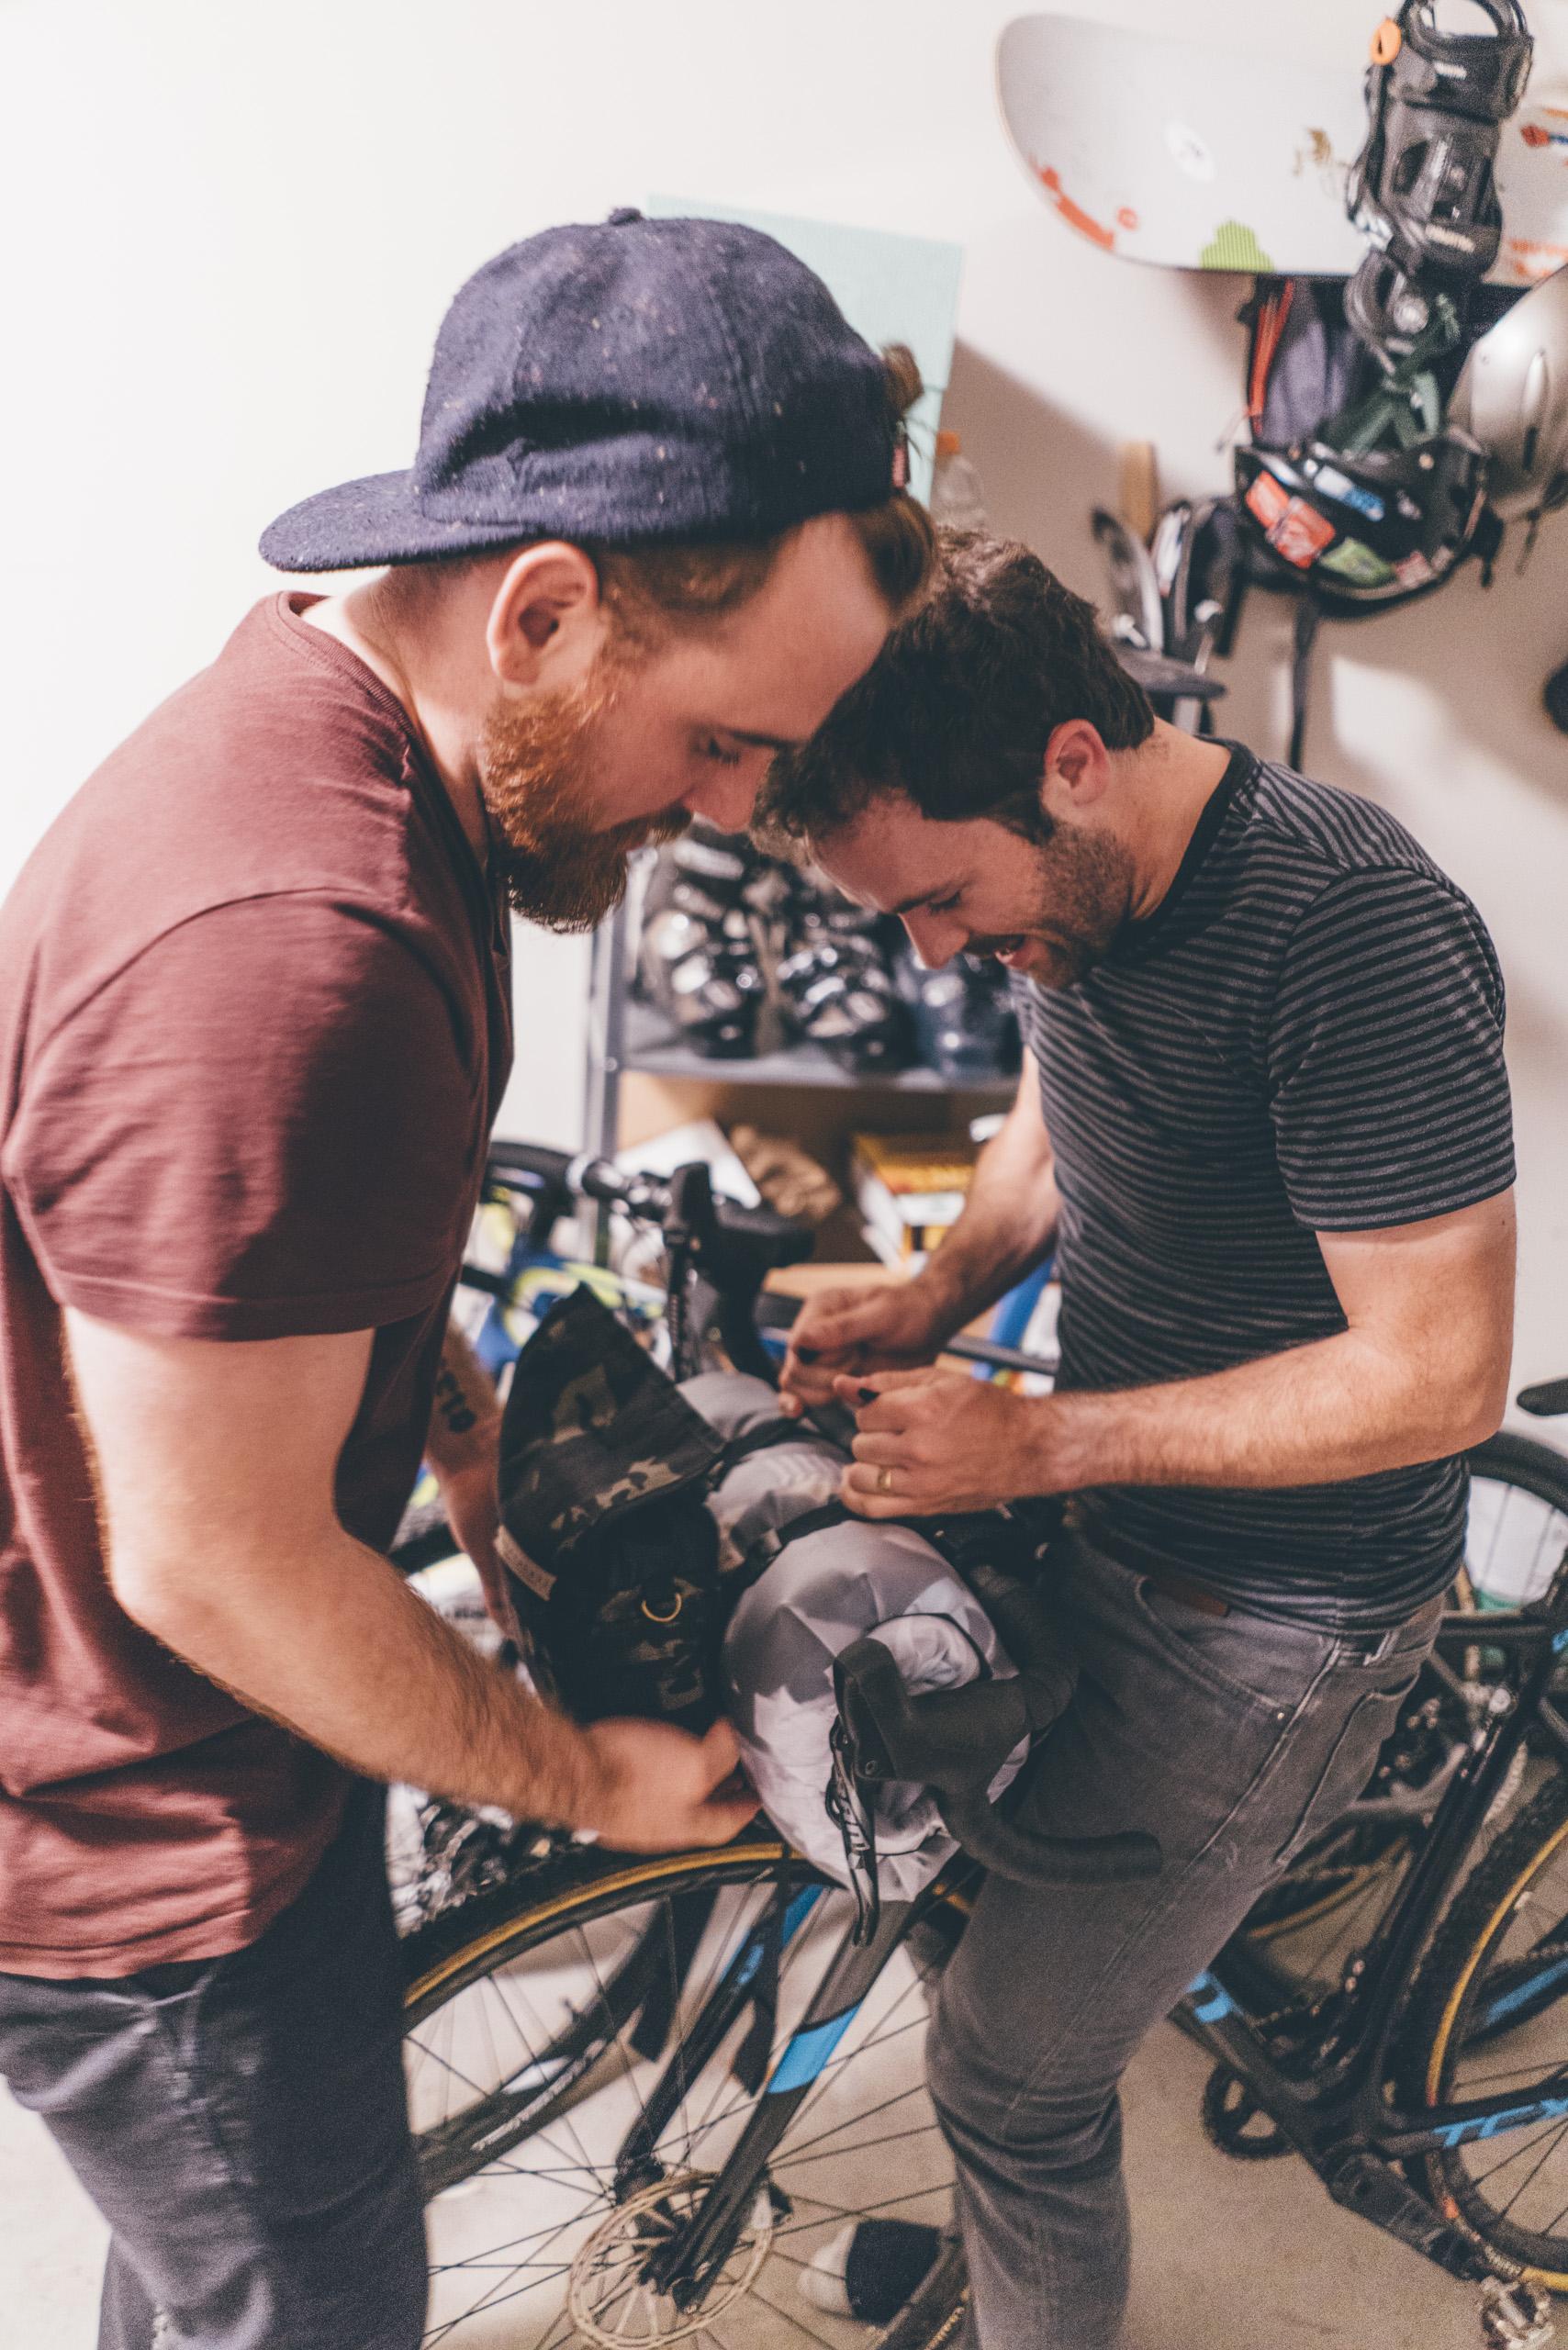 Bikepacking-VanIsland-JohnsonStudios-201806-4.jpg